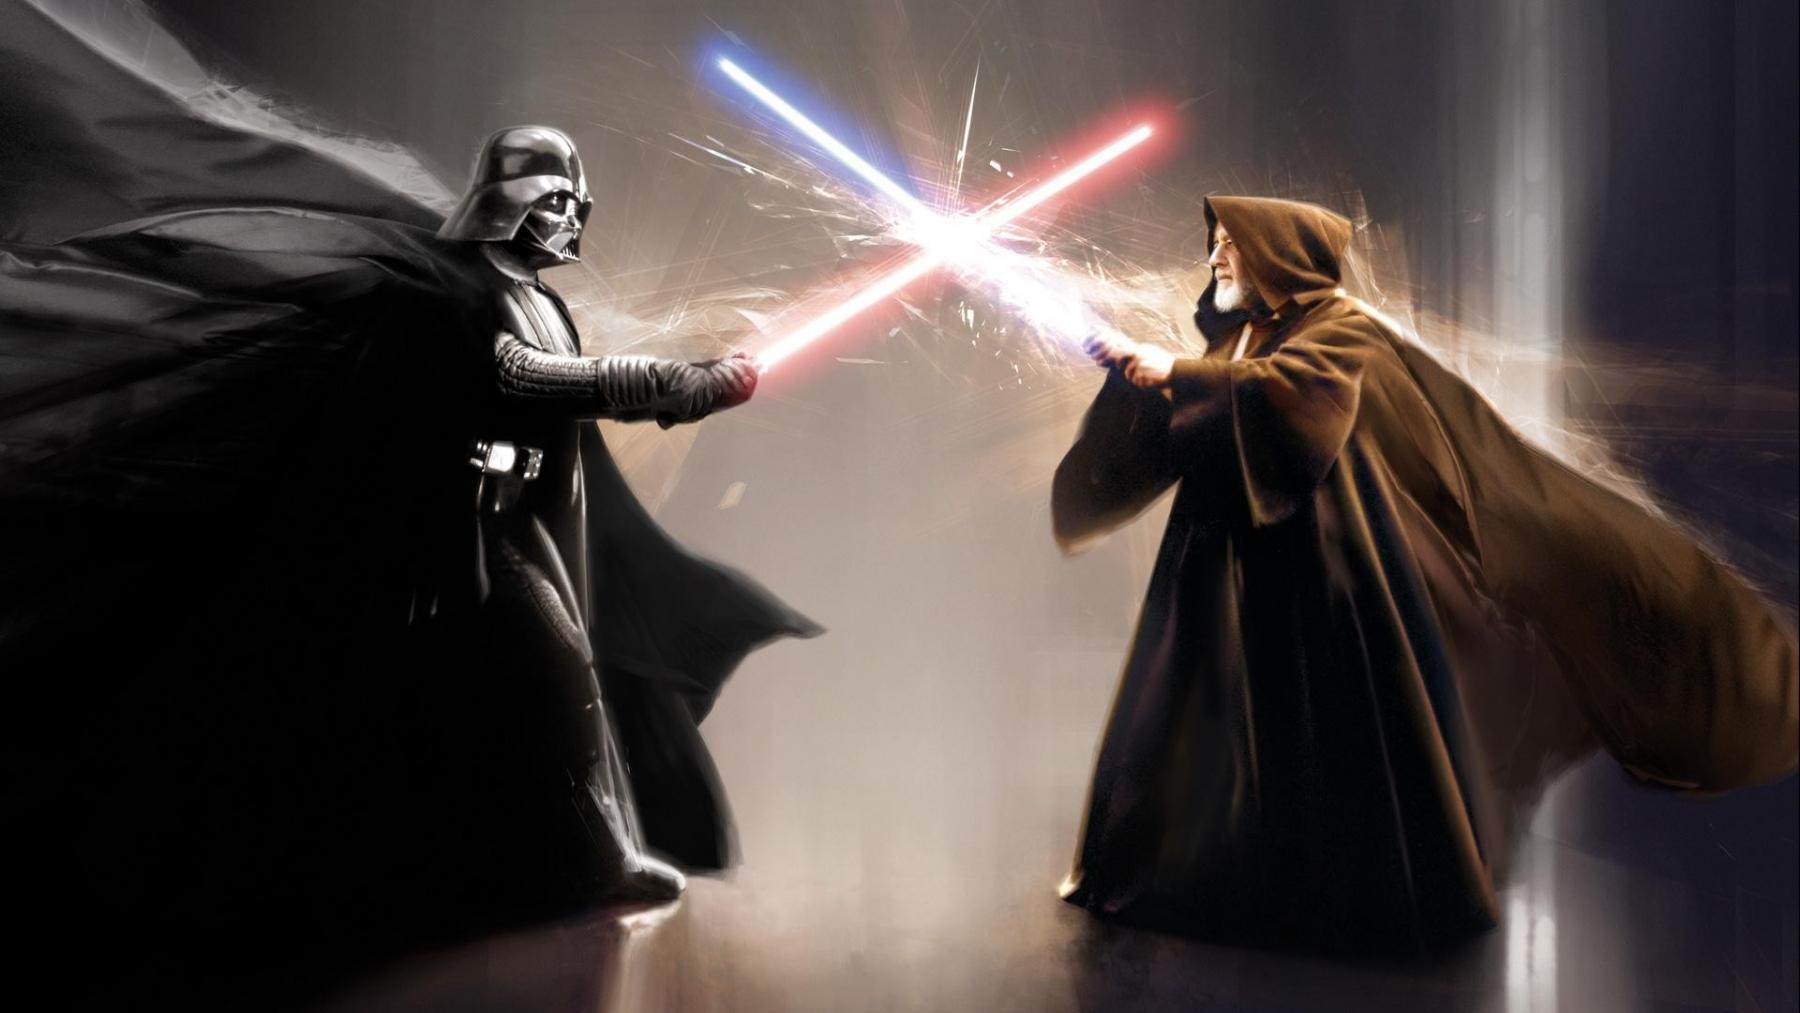 Star Wars Obiwan Vs Darth Vader 1800x1013 Download Hd Wallpaper Wallpapertip